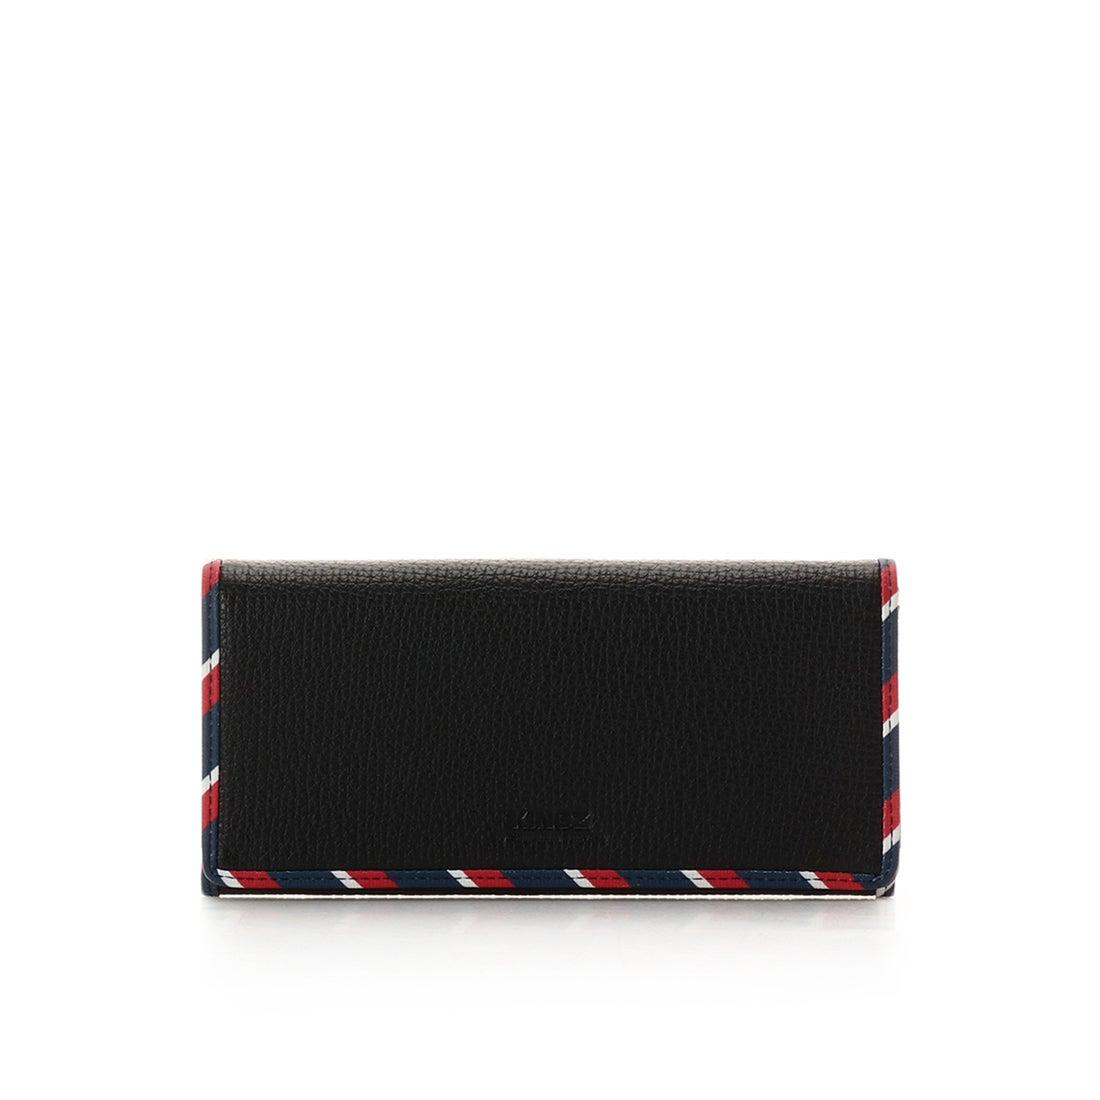 2de81b49ed69 キングズ バイ サマンサタバサ トリコロール 長財布 ブラック. ¥20,520. ロコンド 靴とファッションの通販サイト